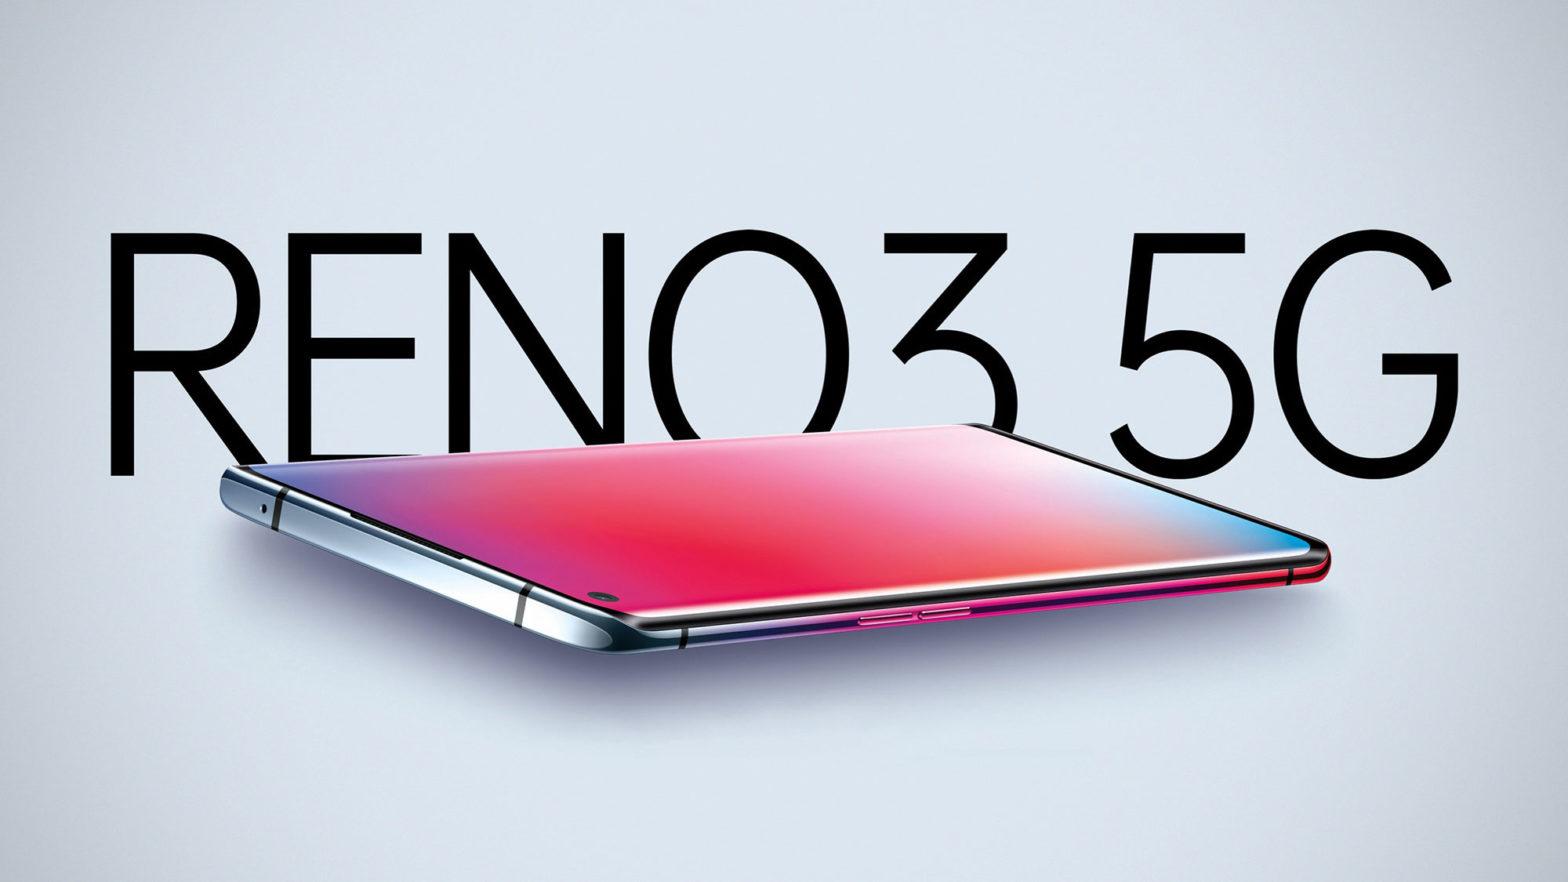 Oppo Reno3 and Reno3 Pro 5G Smartphones